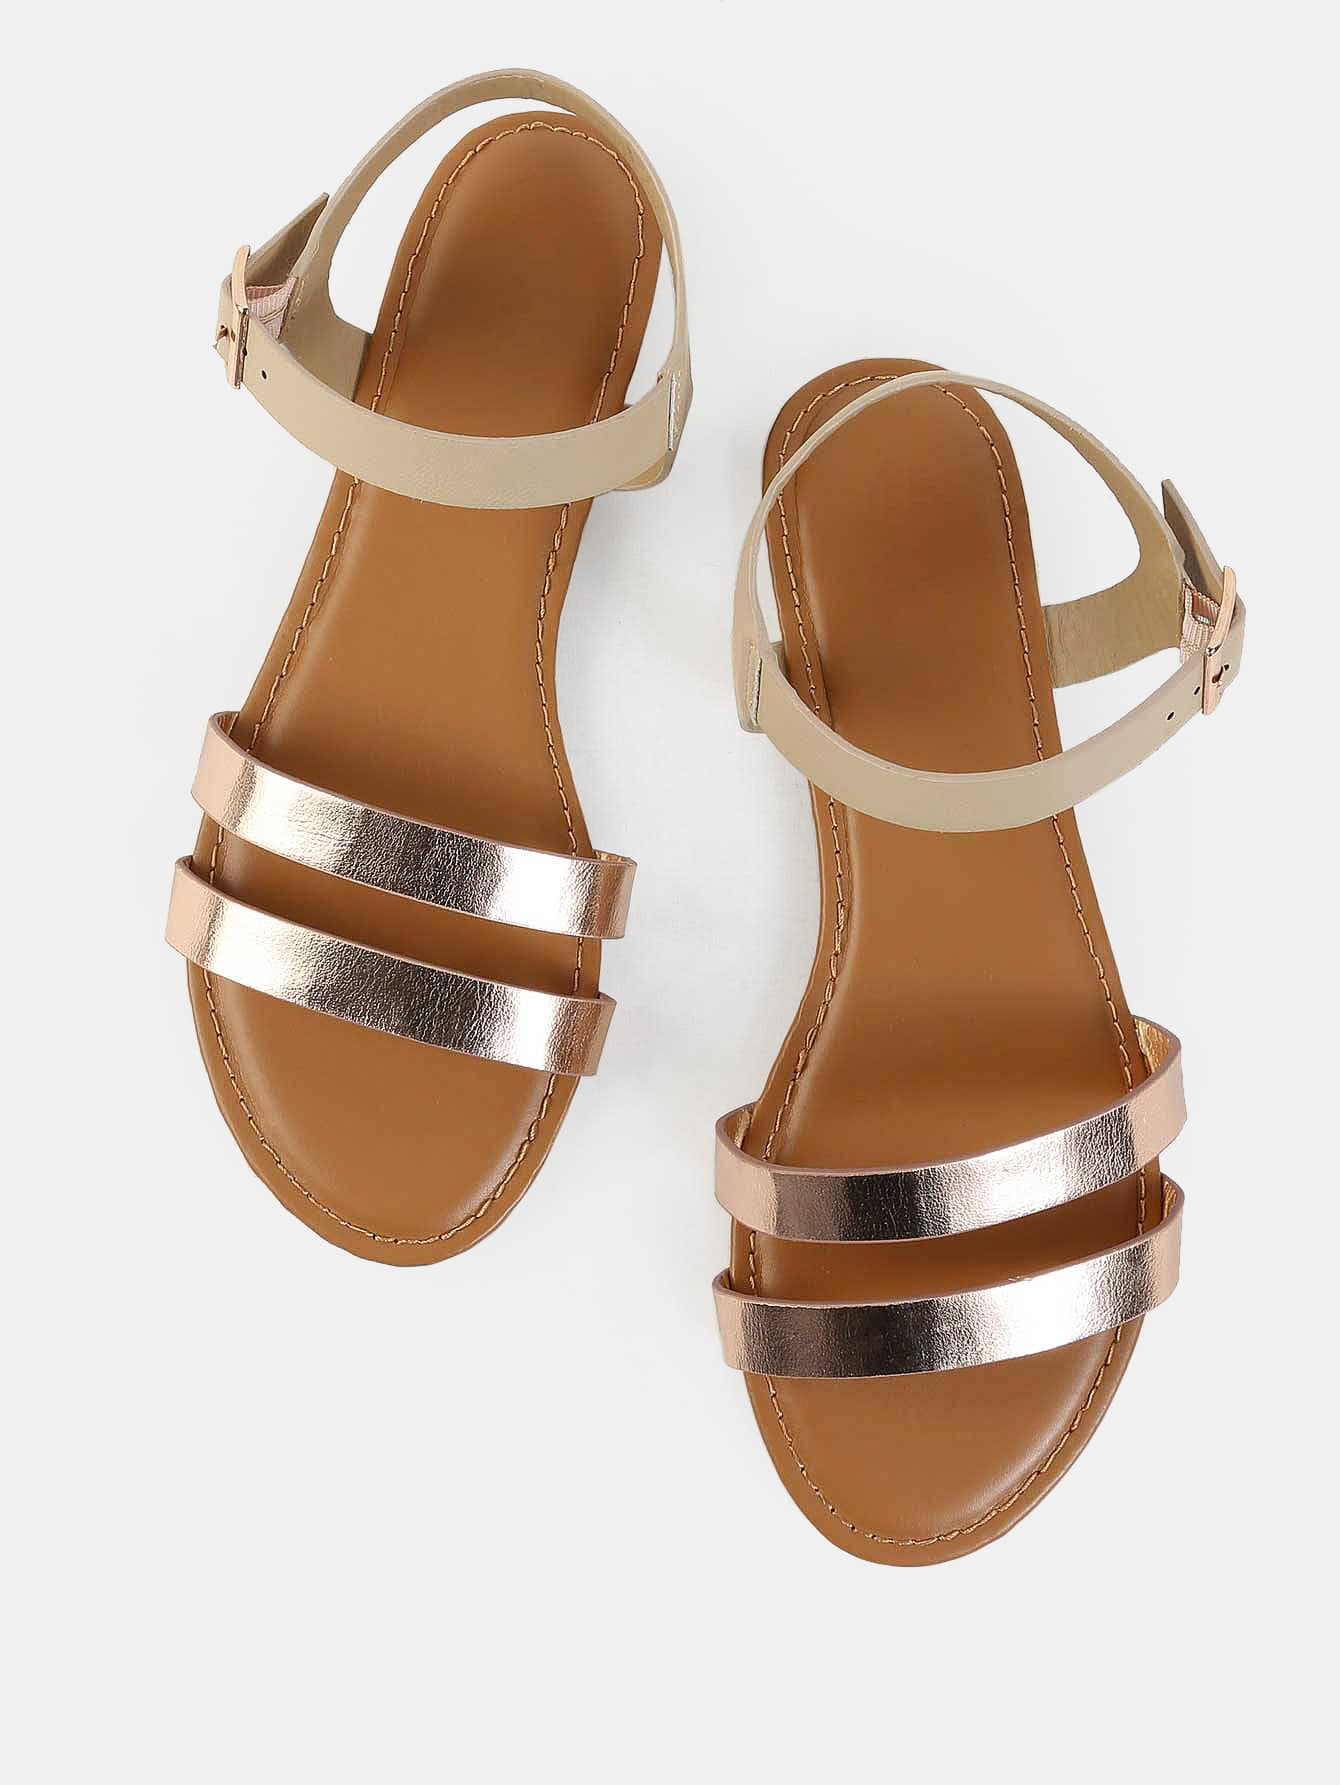 Metallic Duo Skinny Strap Sandals ROSE GOLD -SheIn(Sheinside)